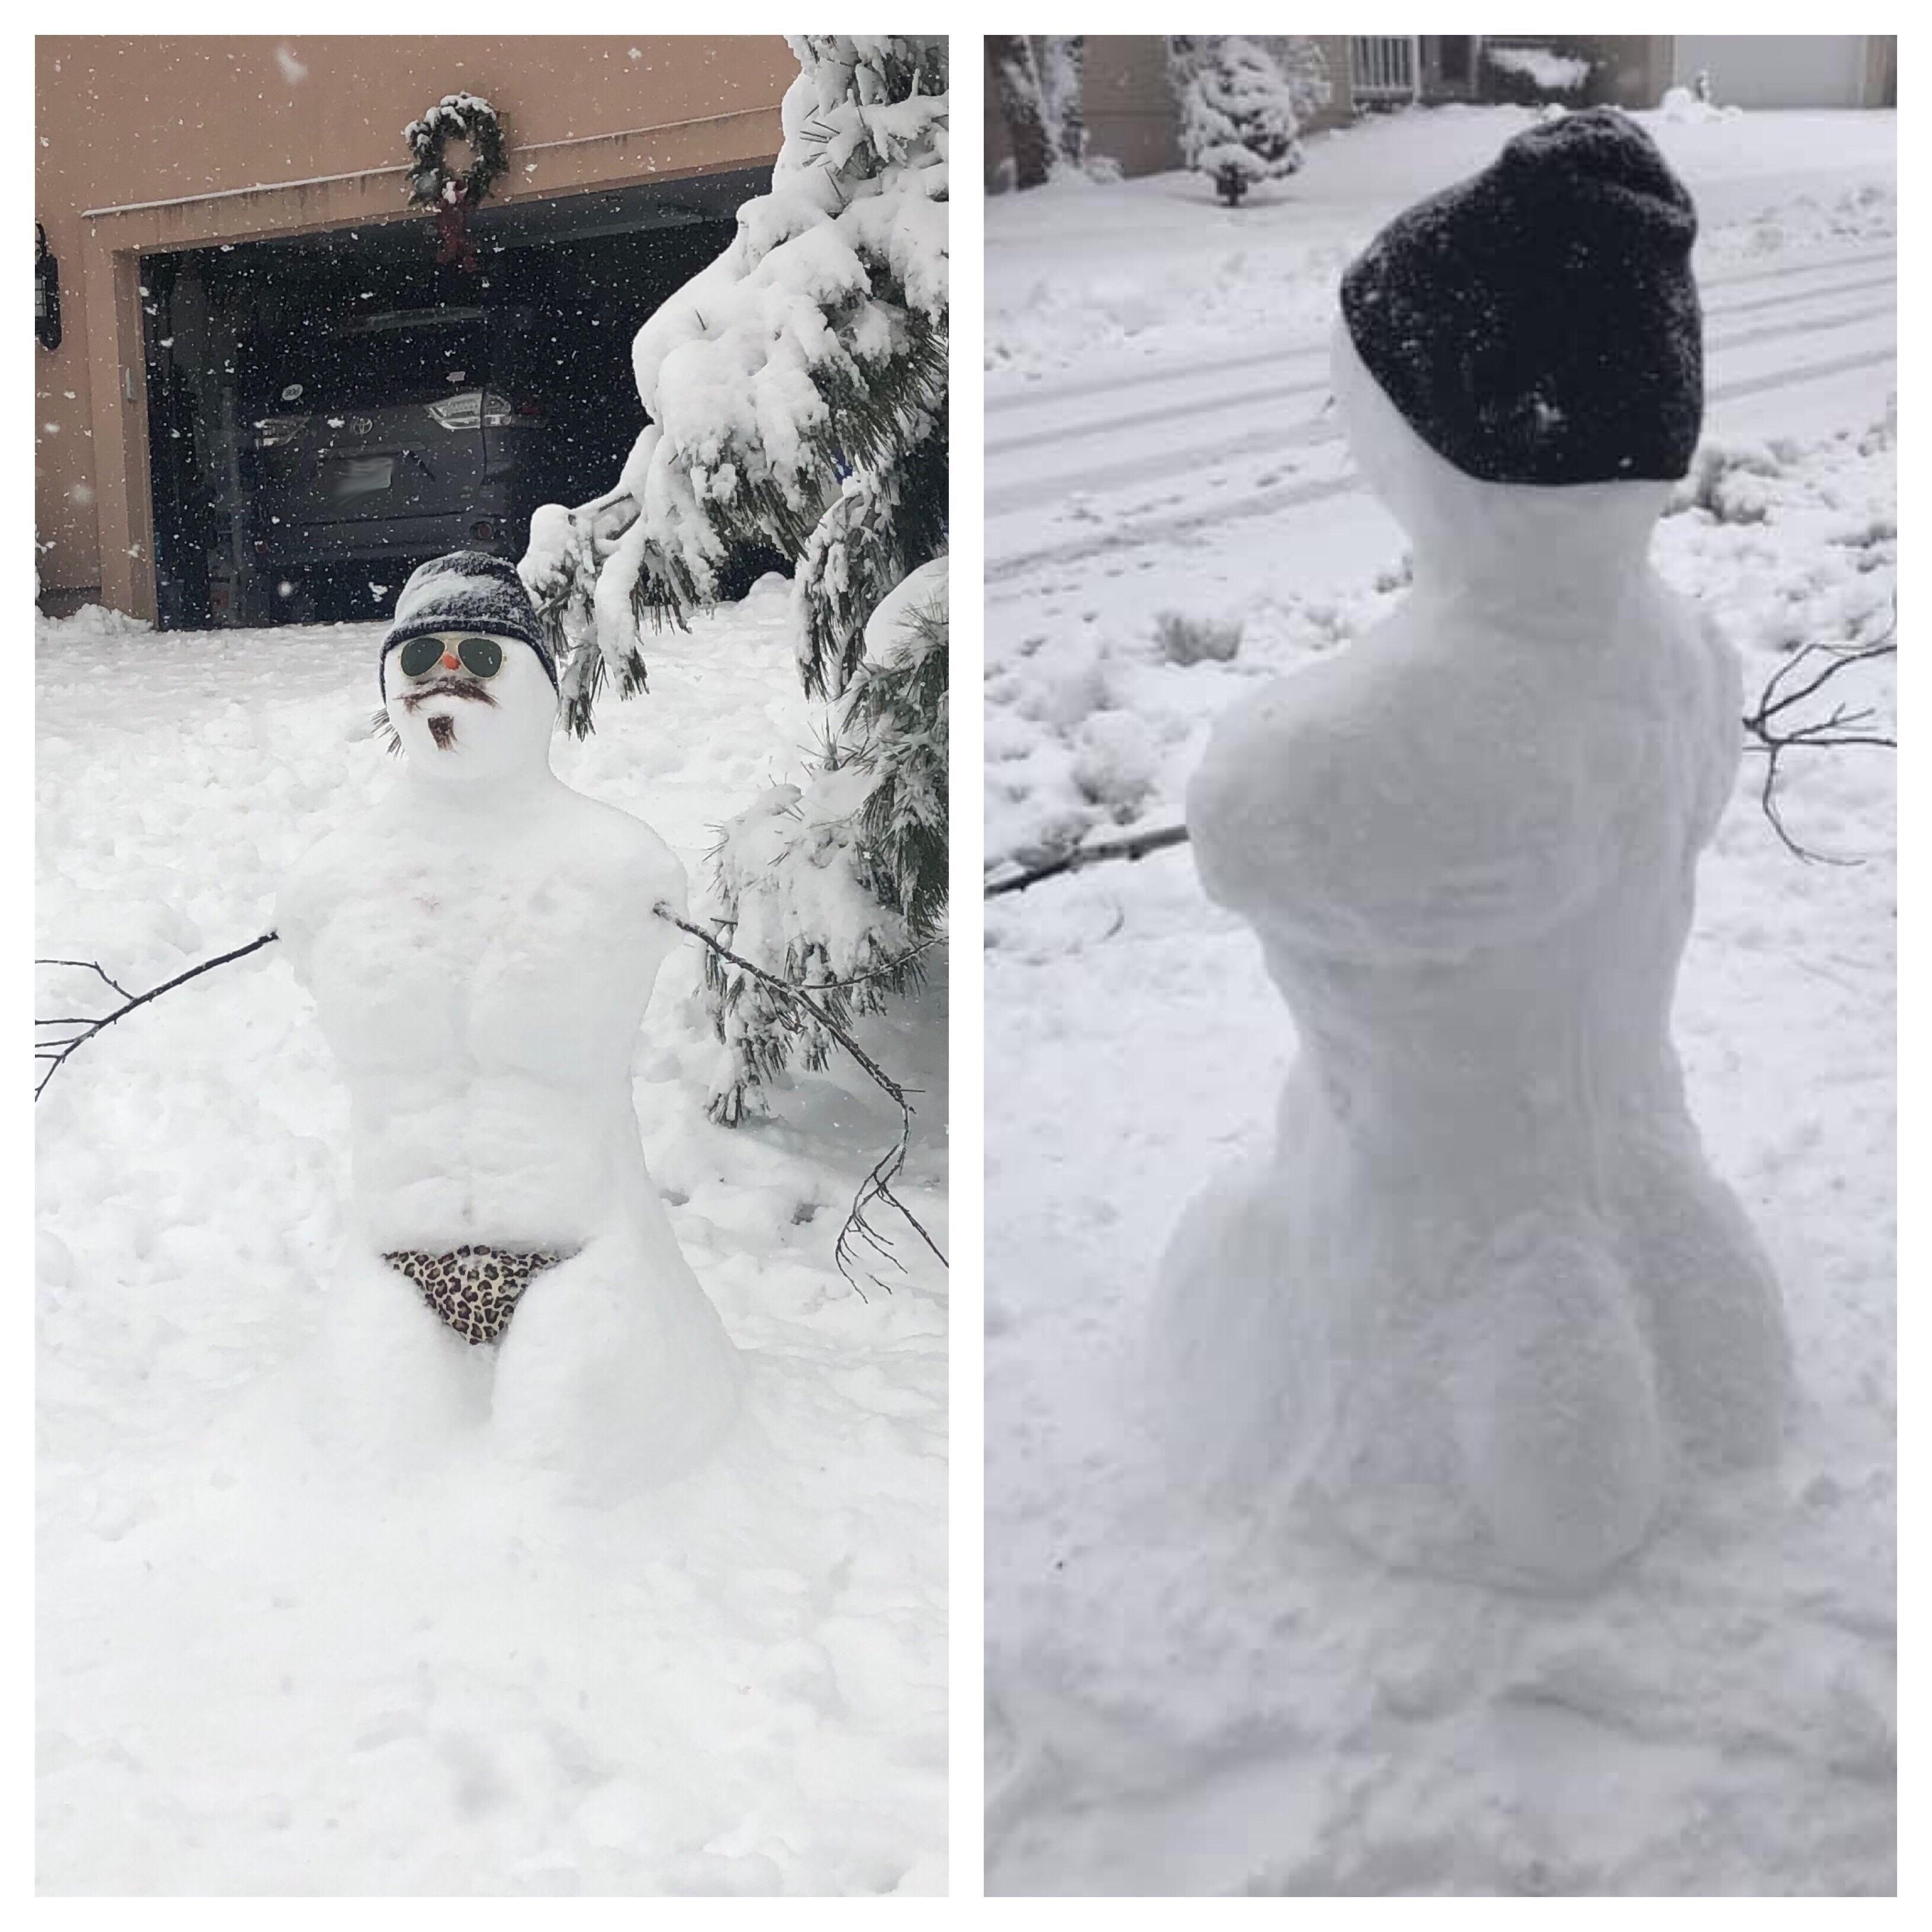 The neighbors made a snowman for the neighborhood to enjoy